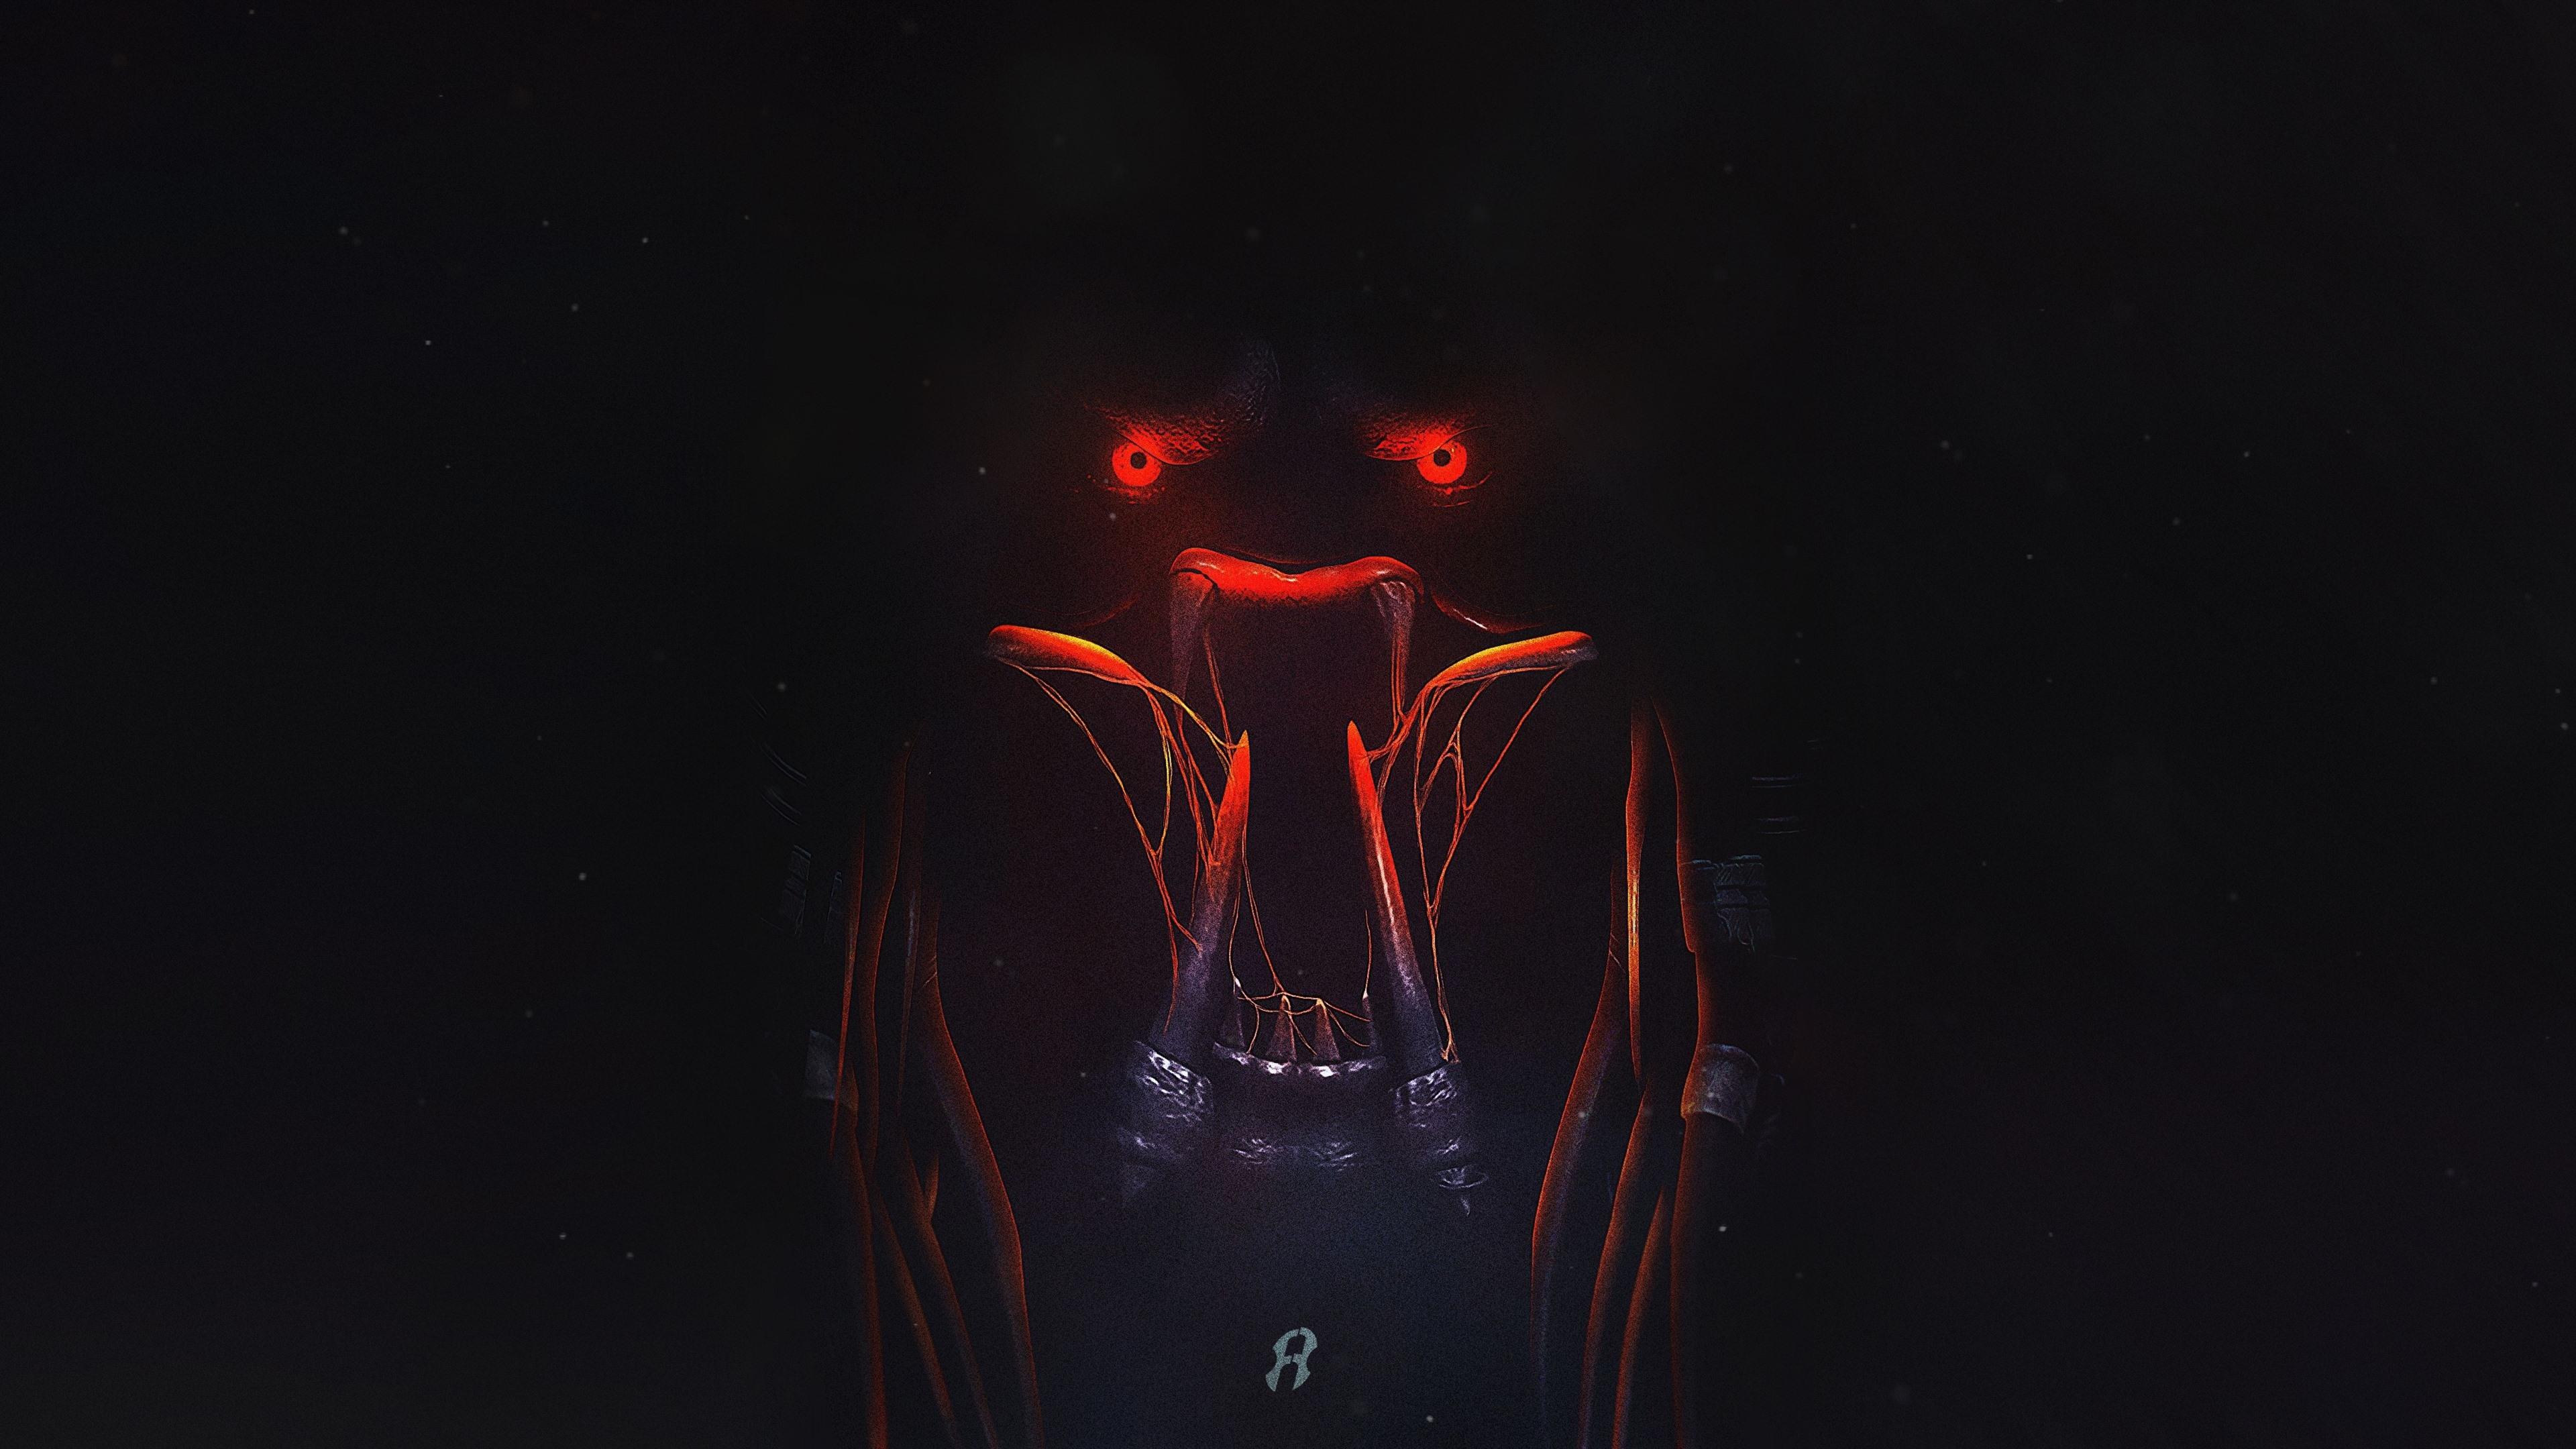 Wallpaper The Predator 2018 Teeth Red Eyes Darkness